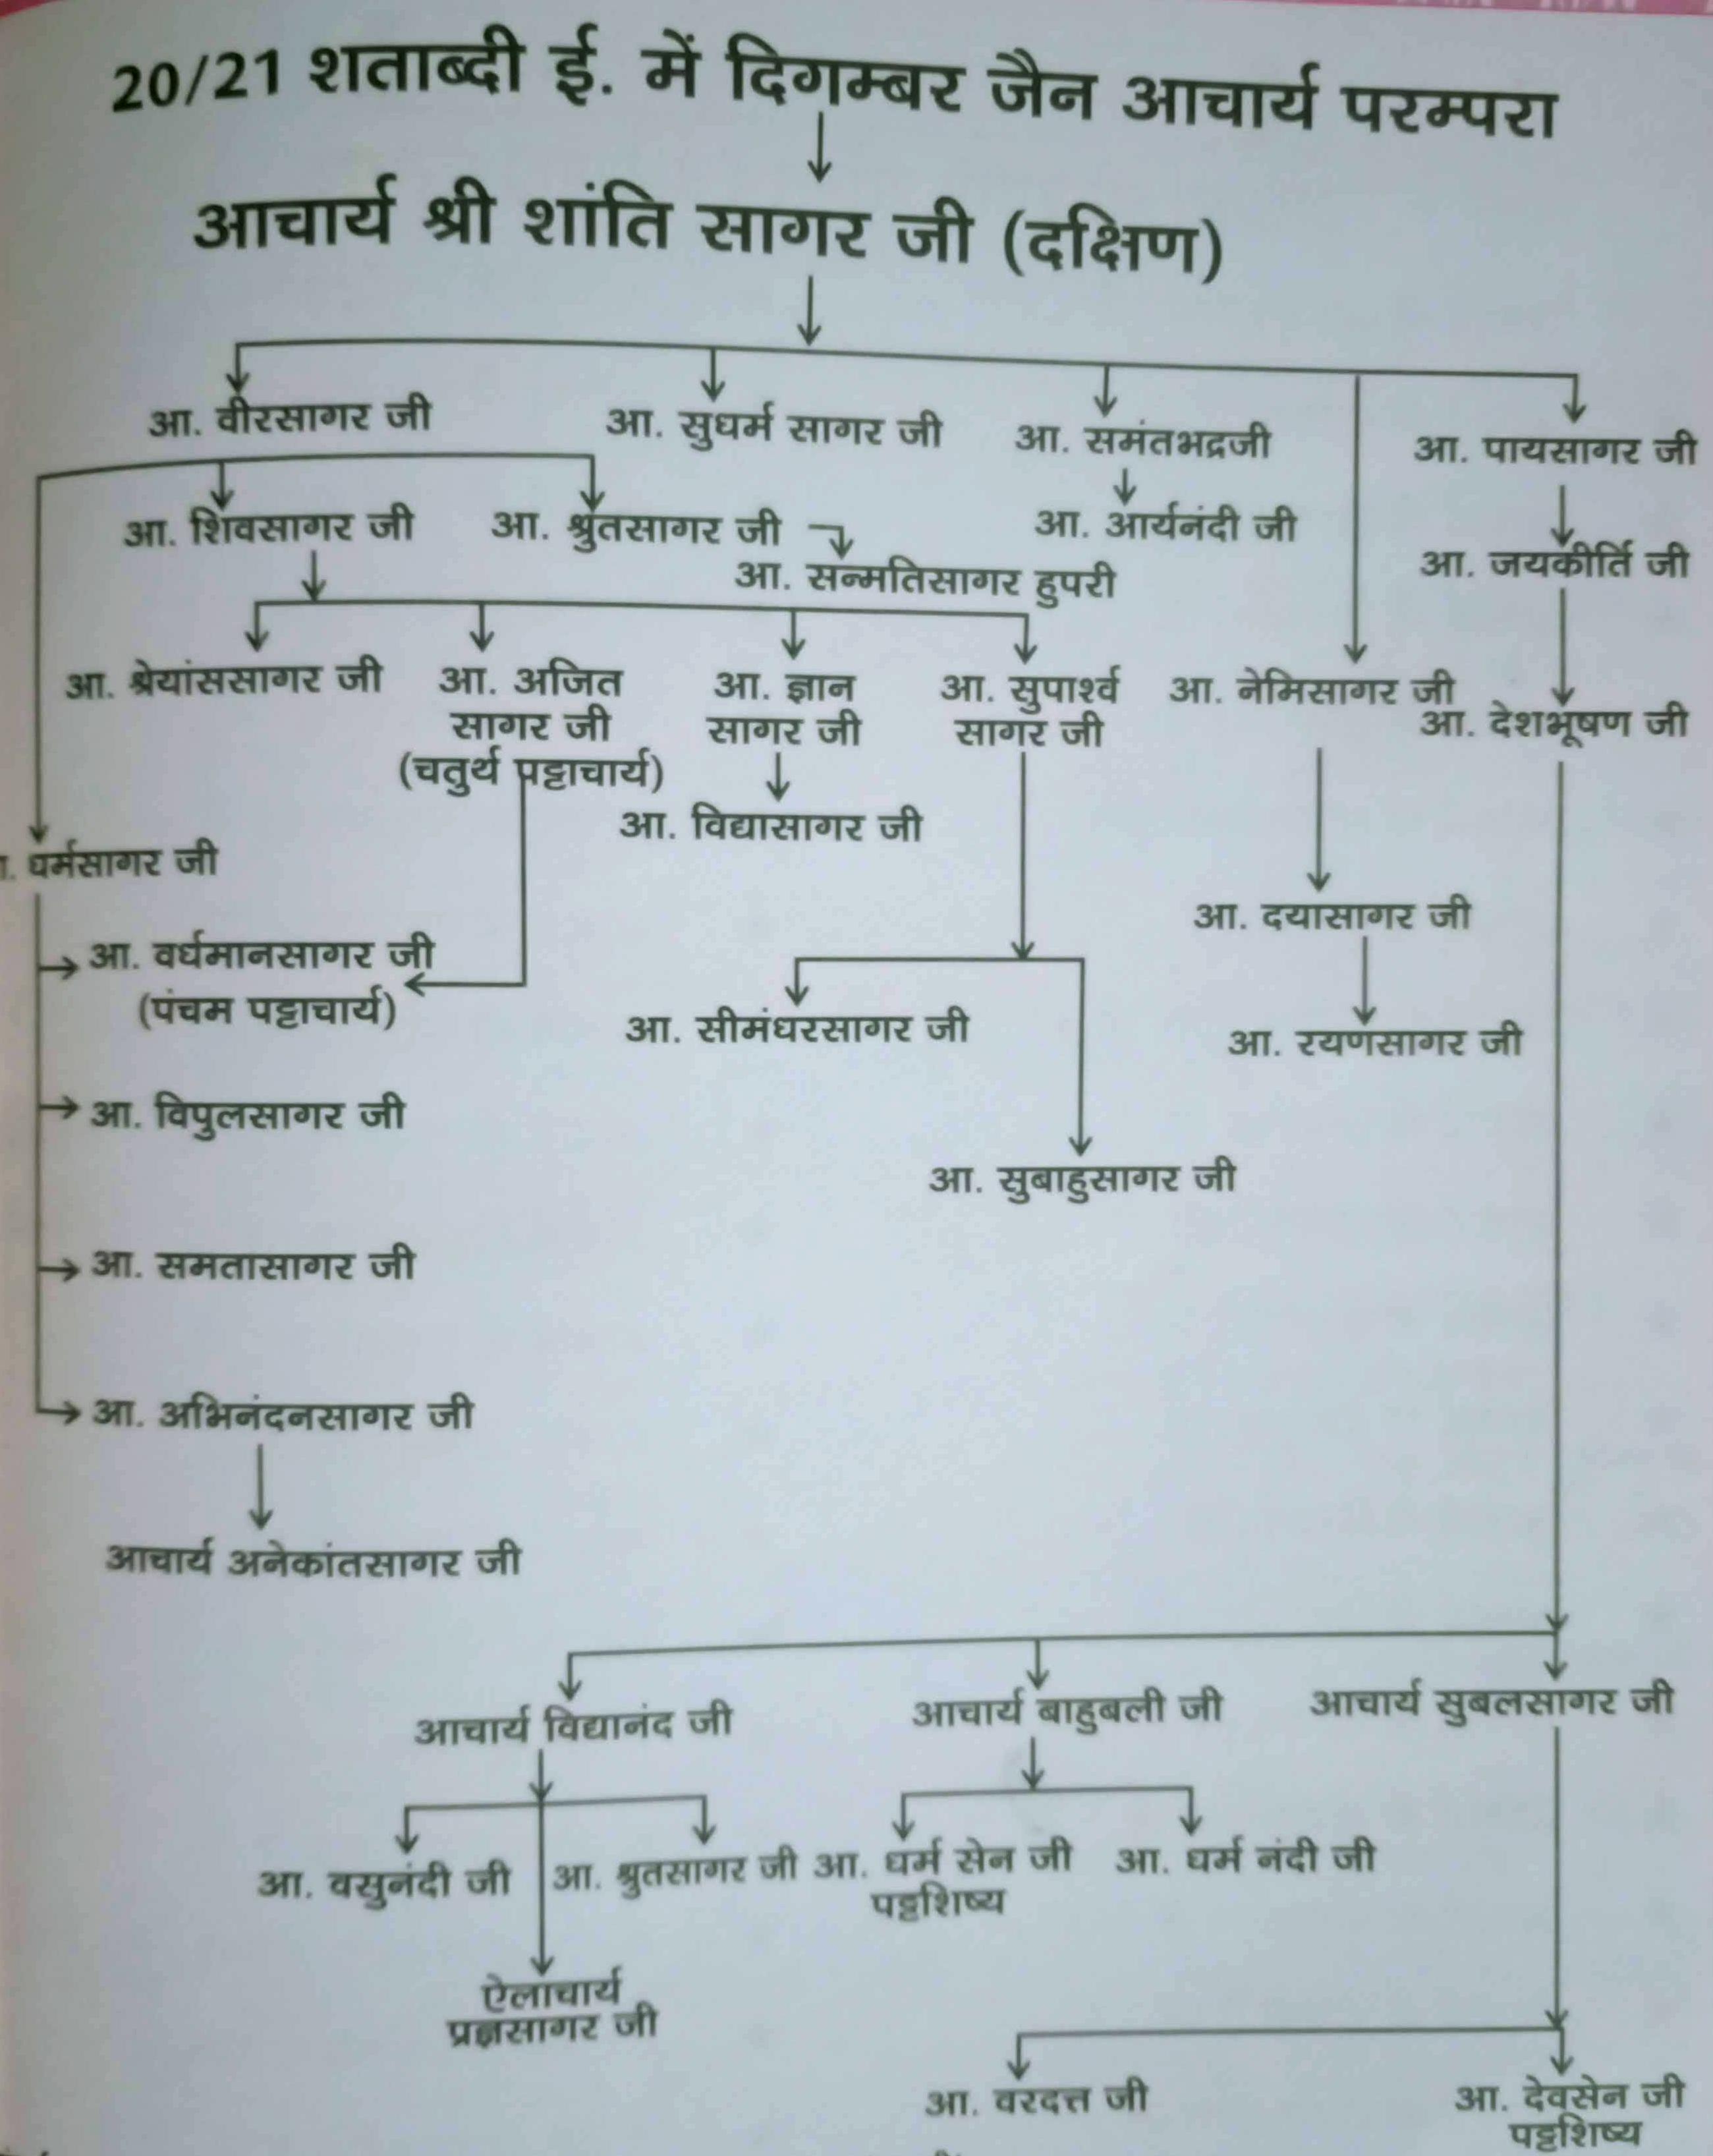 Shanti Sagarji Maharaj Lineage